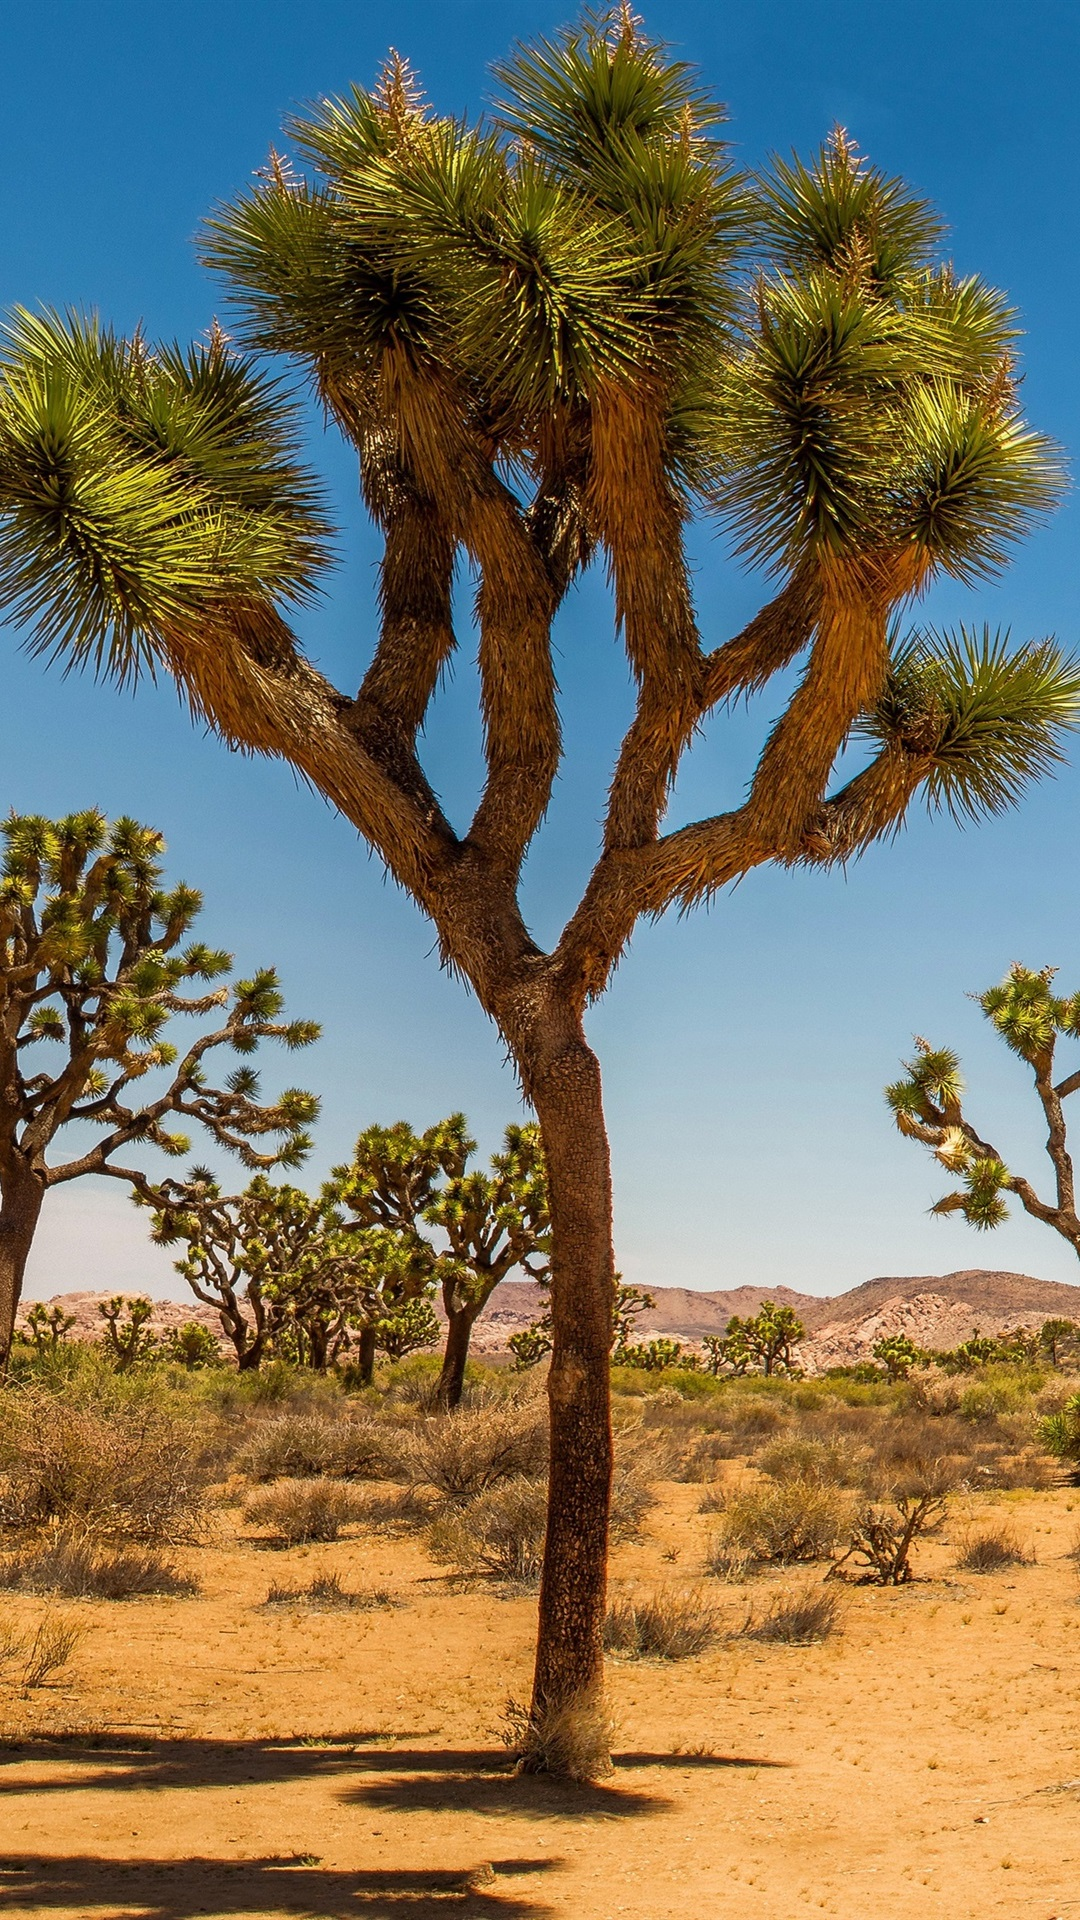 Joshua Tree National Park Usa Desert Shrub Trees Grass 1080x1920 Iphone 8 7 6 6s Plus Wallpaper Background Picture Image